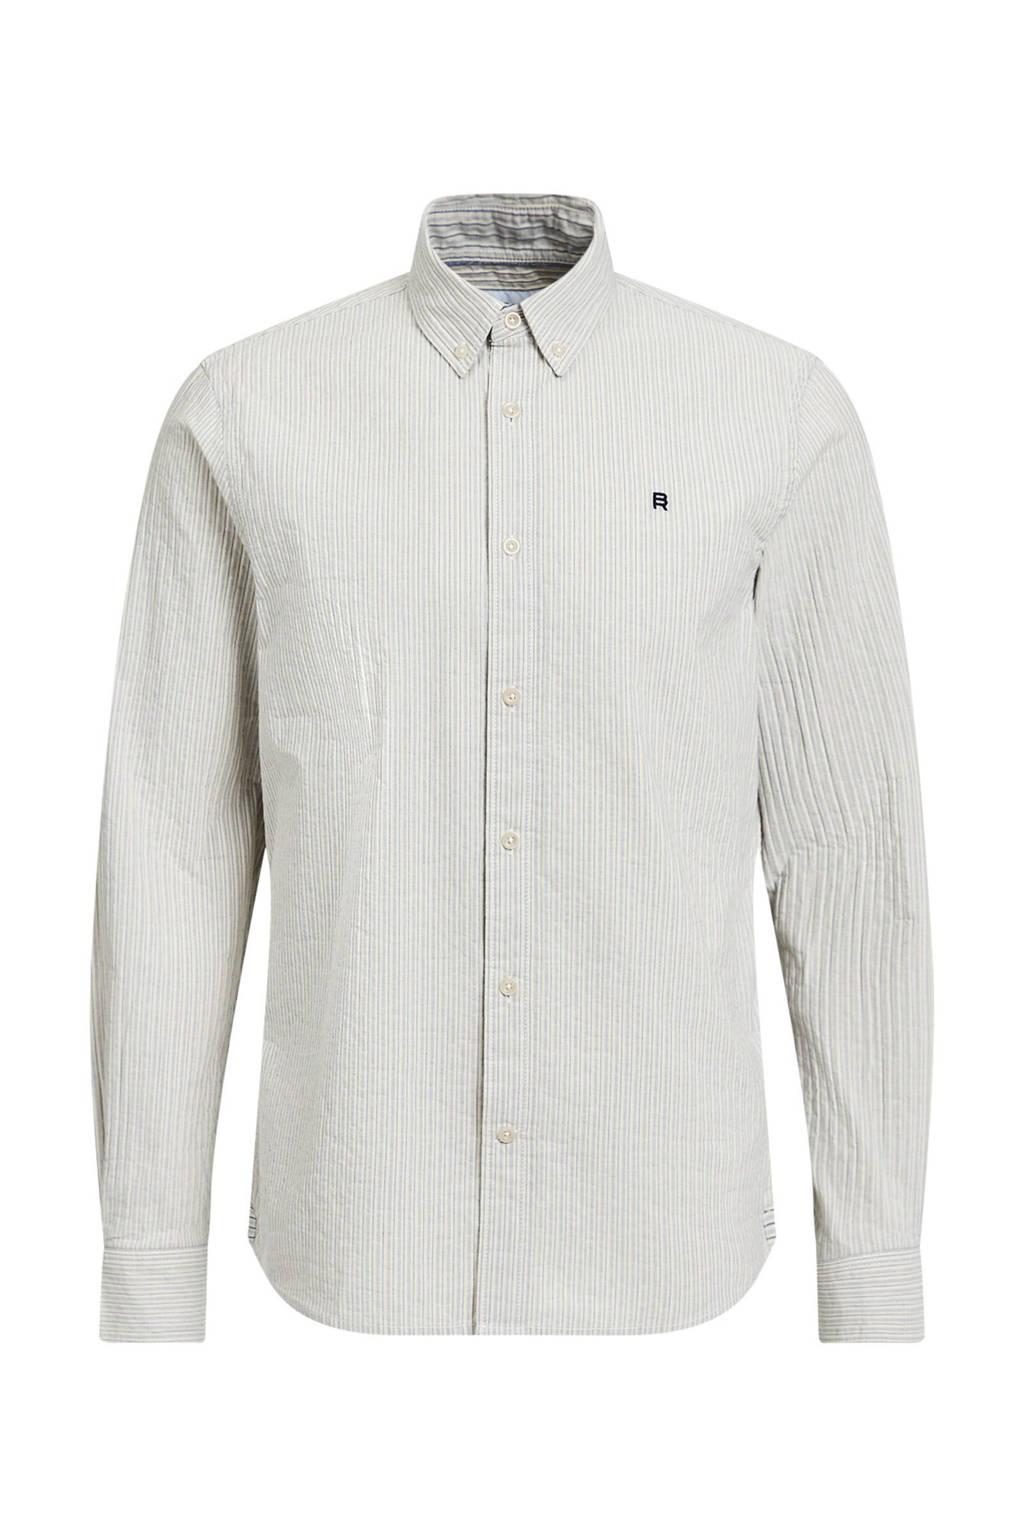 WE Fashion Blue Ridge gestreept slim fit overhemd wit, Wit